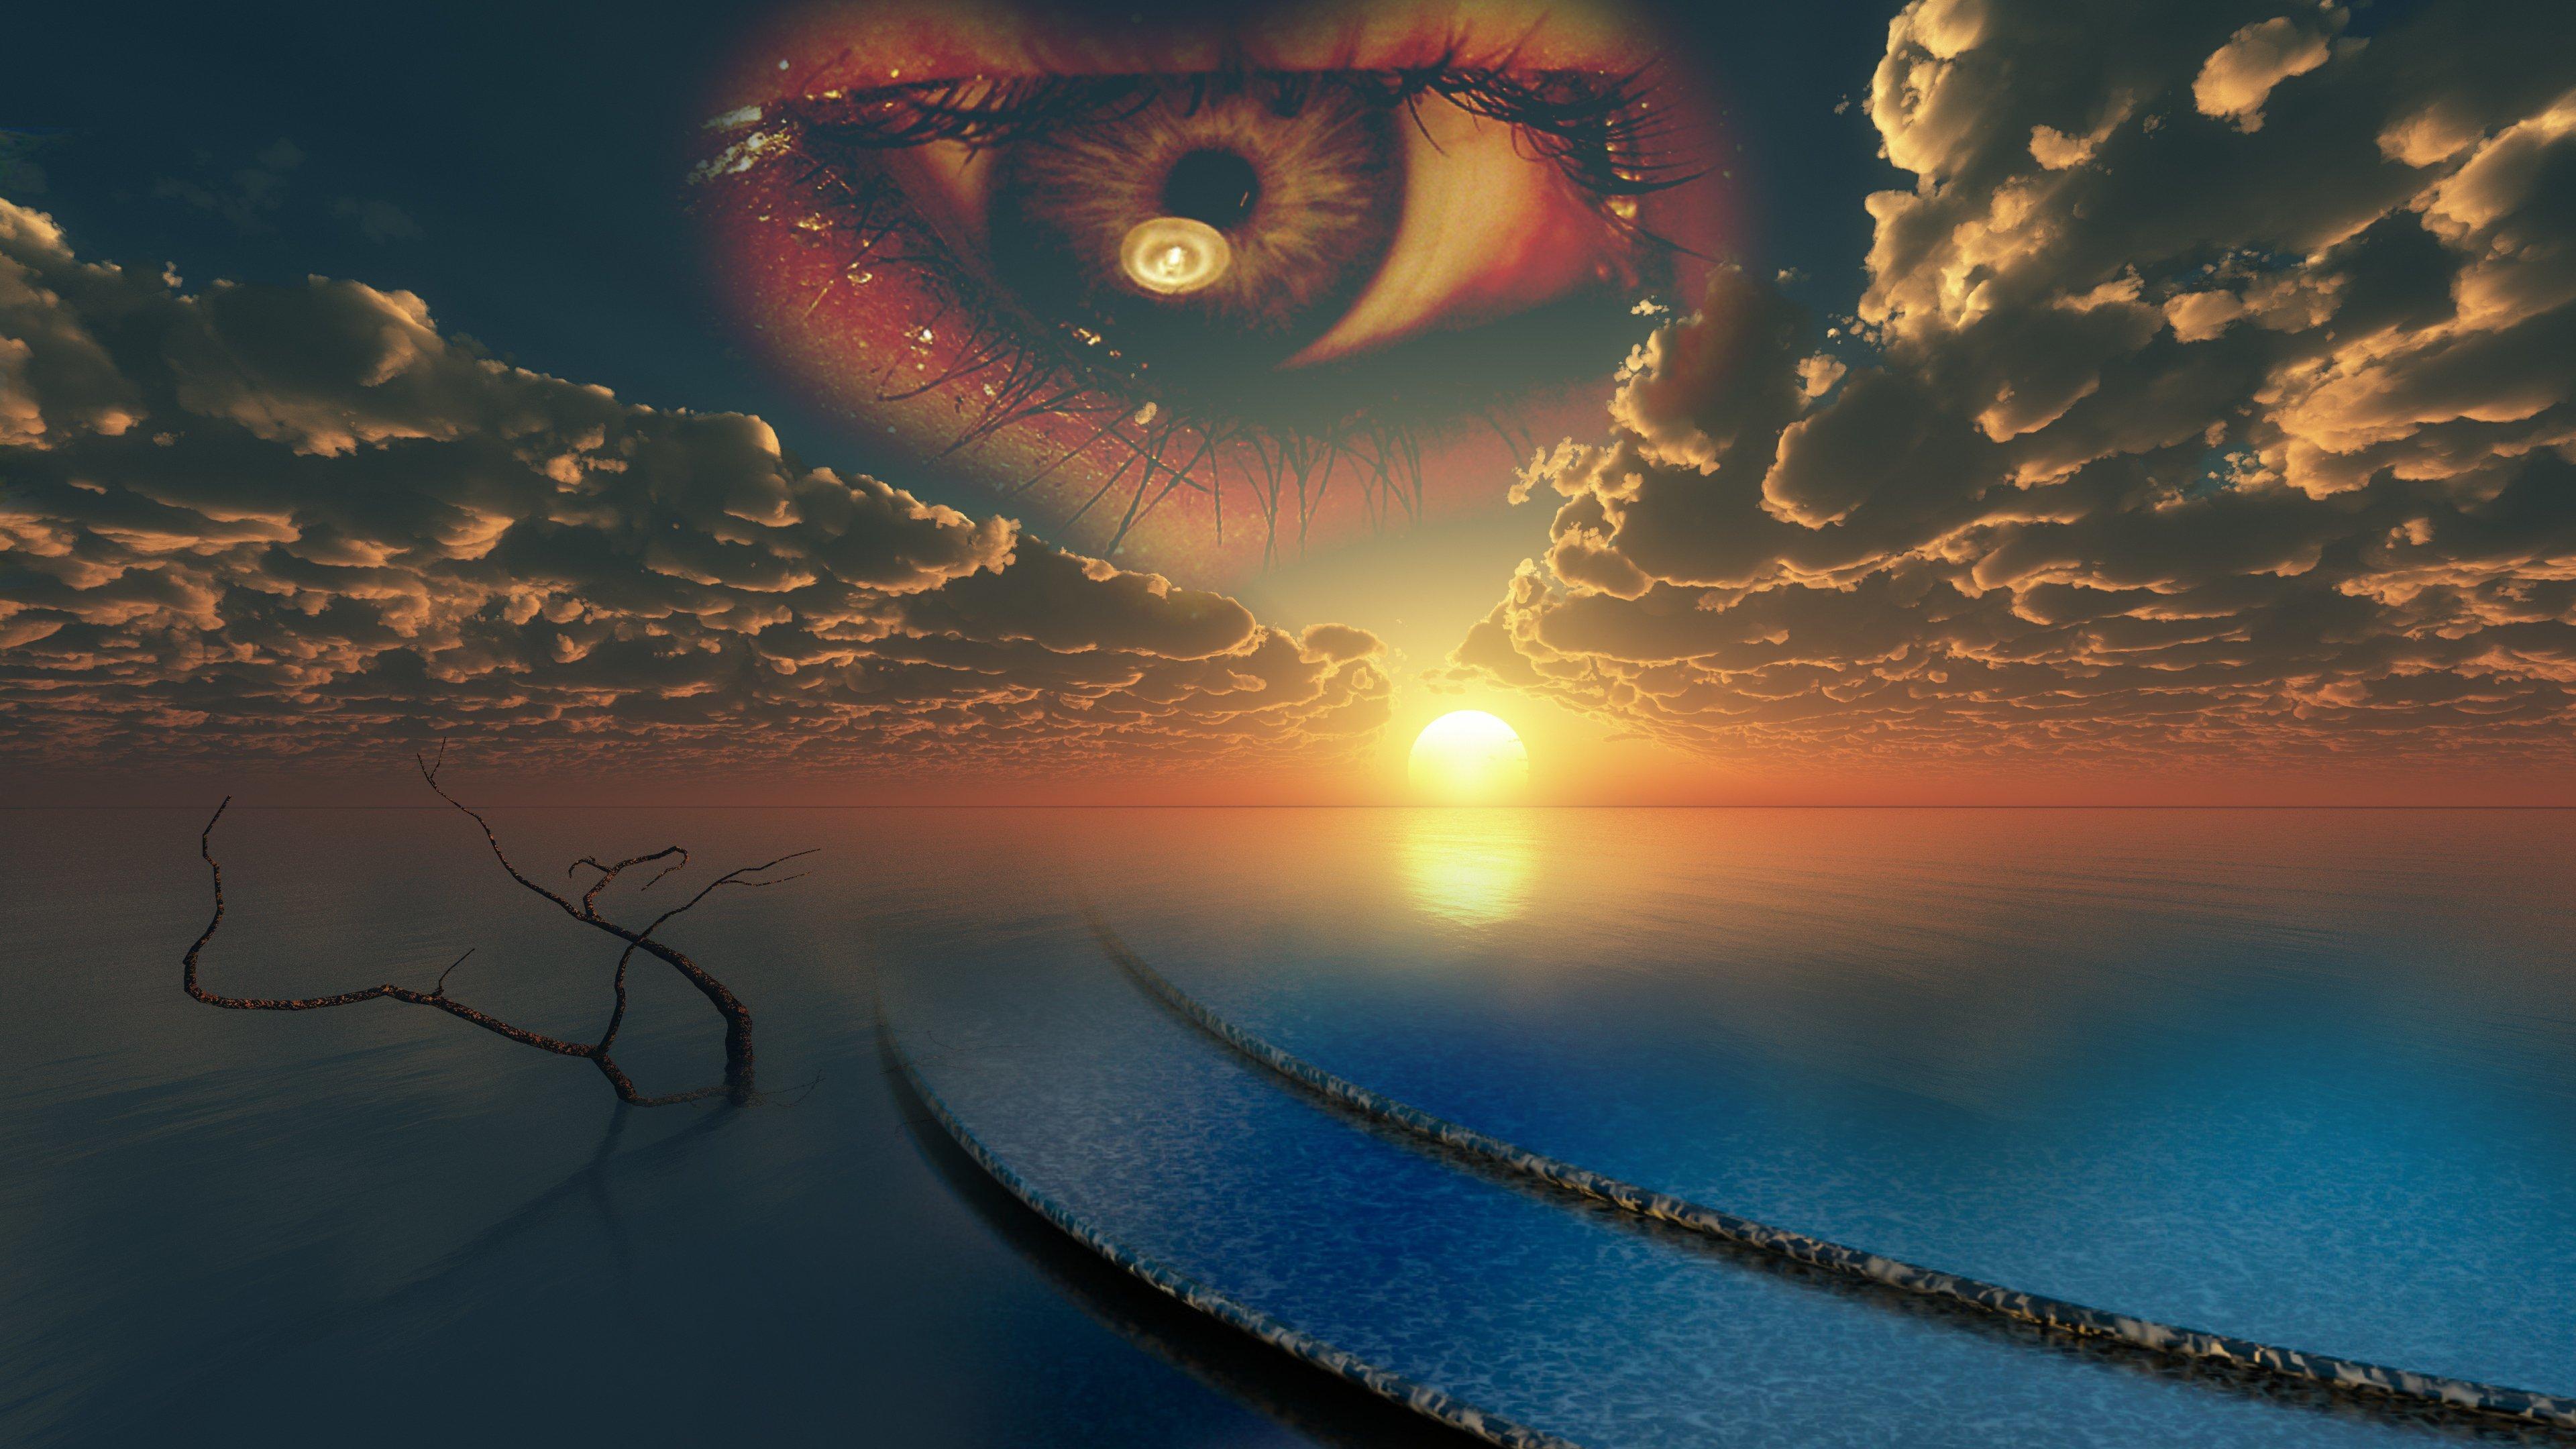 Magic Eye Wallpapers 3840x2160 Ultra Hd 4k Desktop Backgrounds